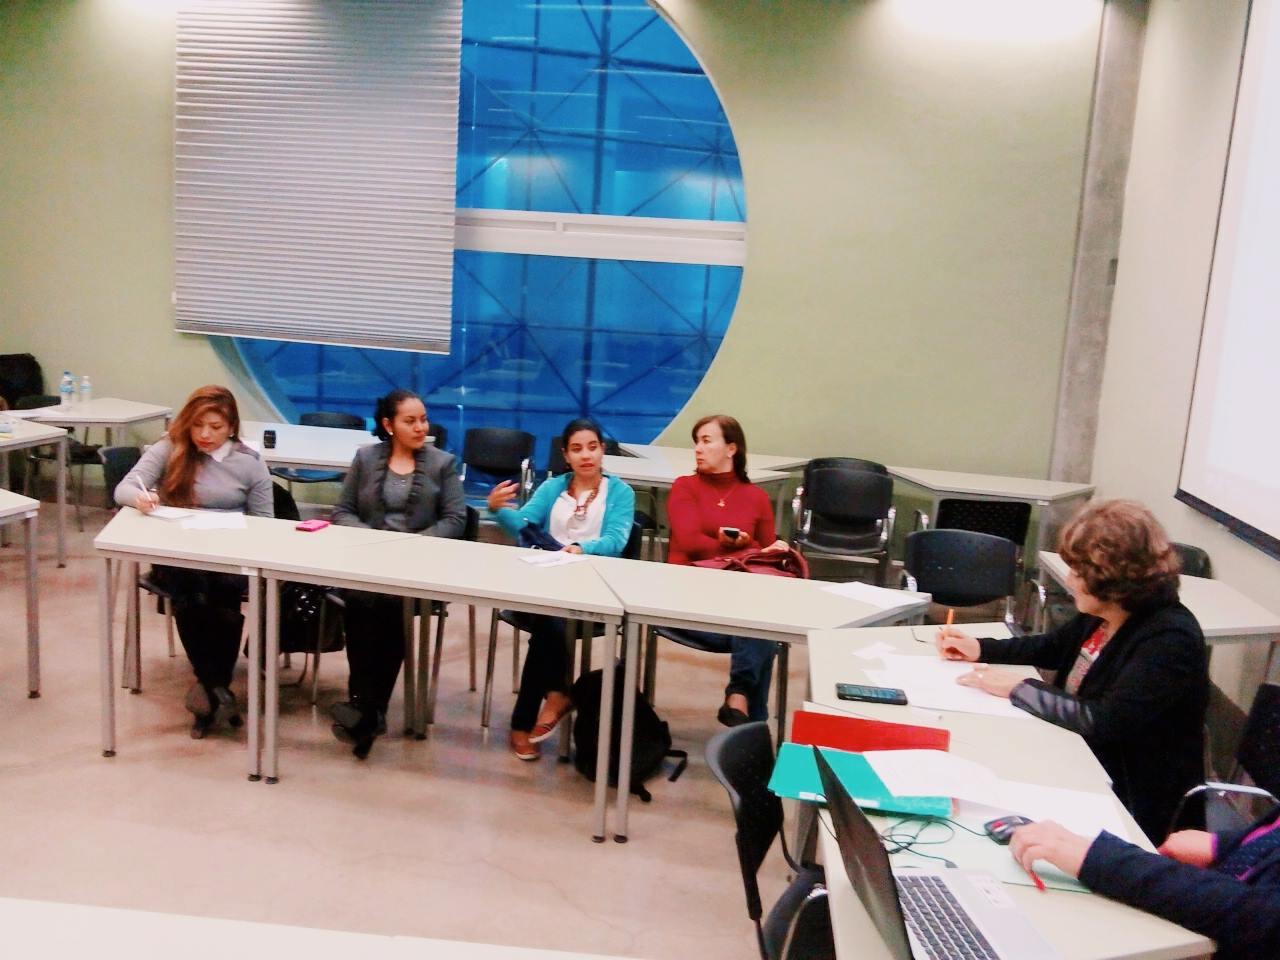 Reunión_internacional_de_la_Asociación_Internacional_de_Educadores_para_la_Paz,_Querétaro_1